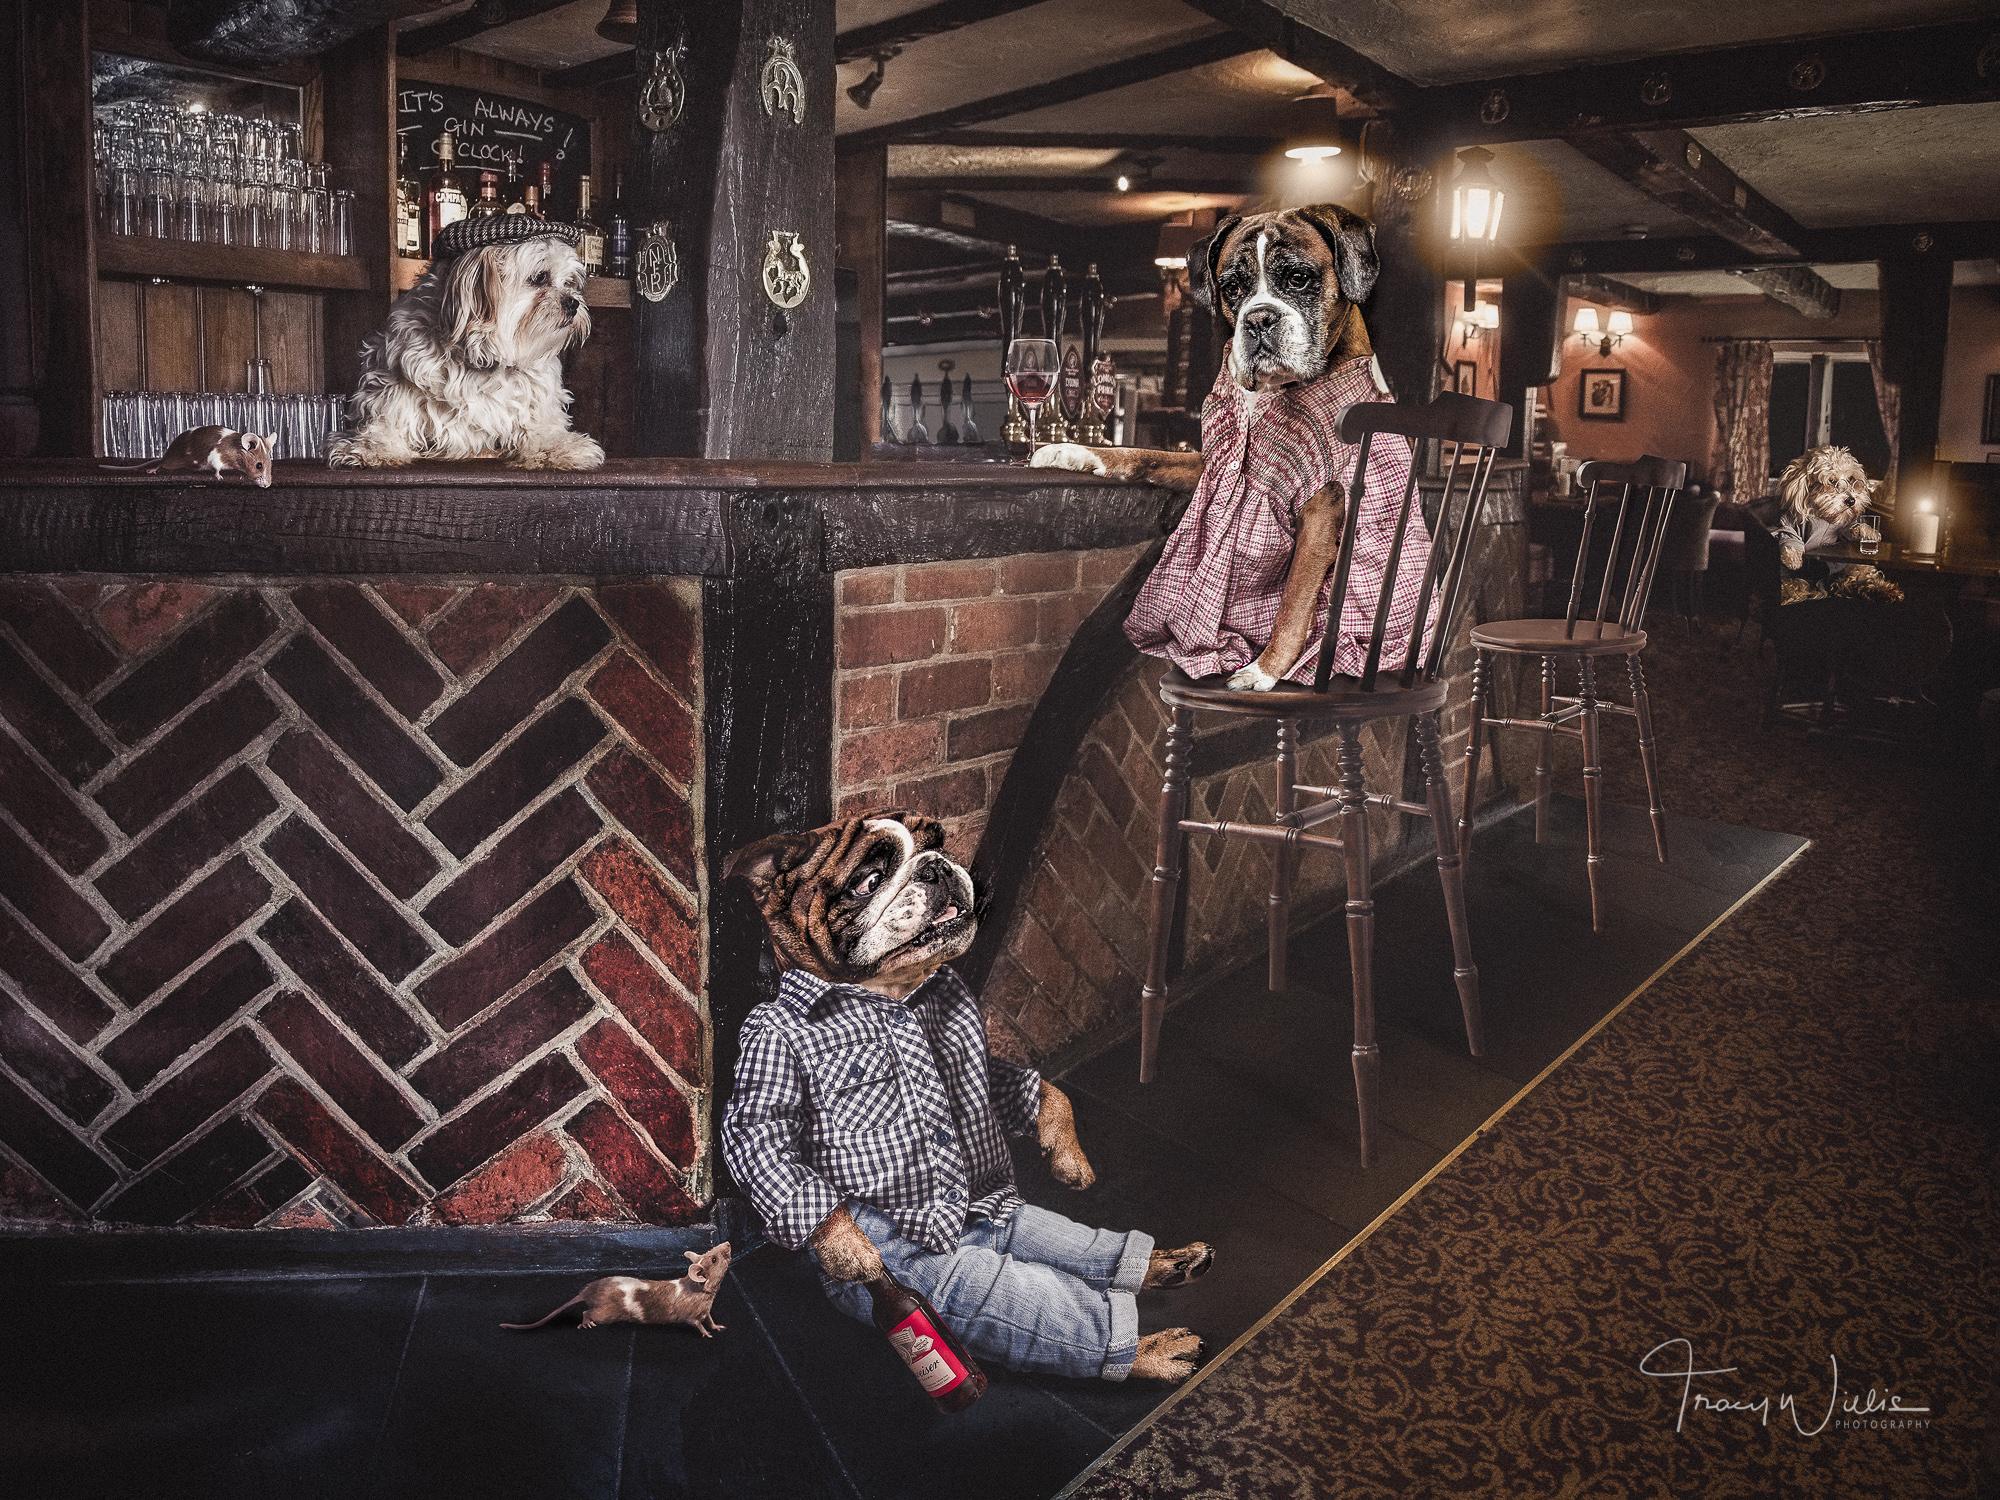 Tracy+Willis+Fine+Art+Photography+Bournemouth-9.jpg